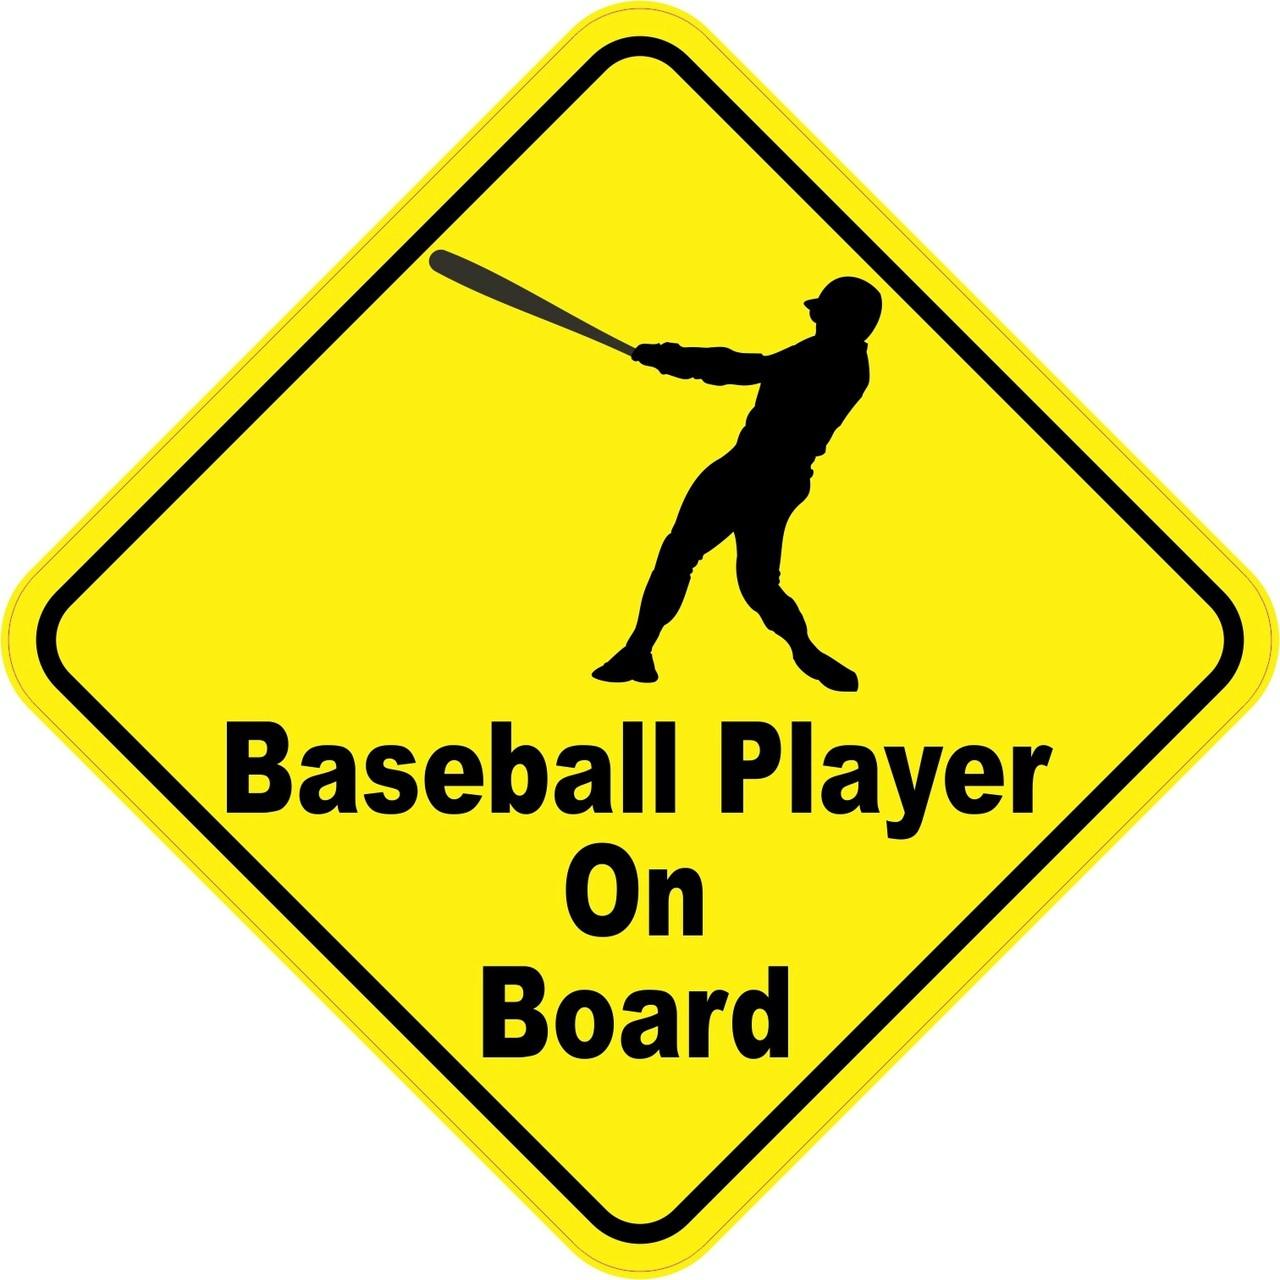 Baseball Player On Board Magnet